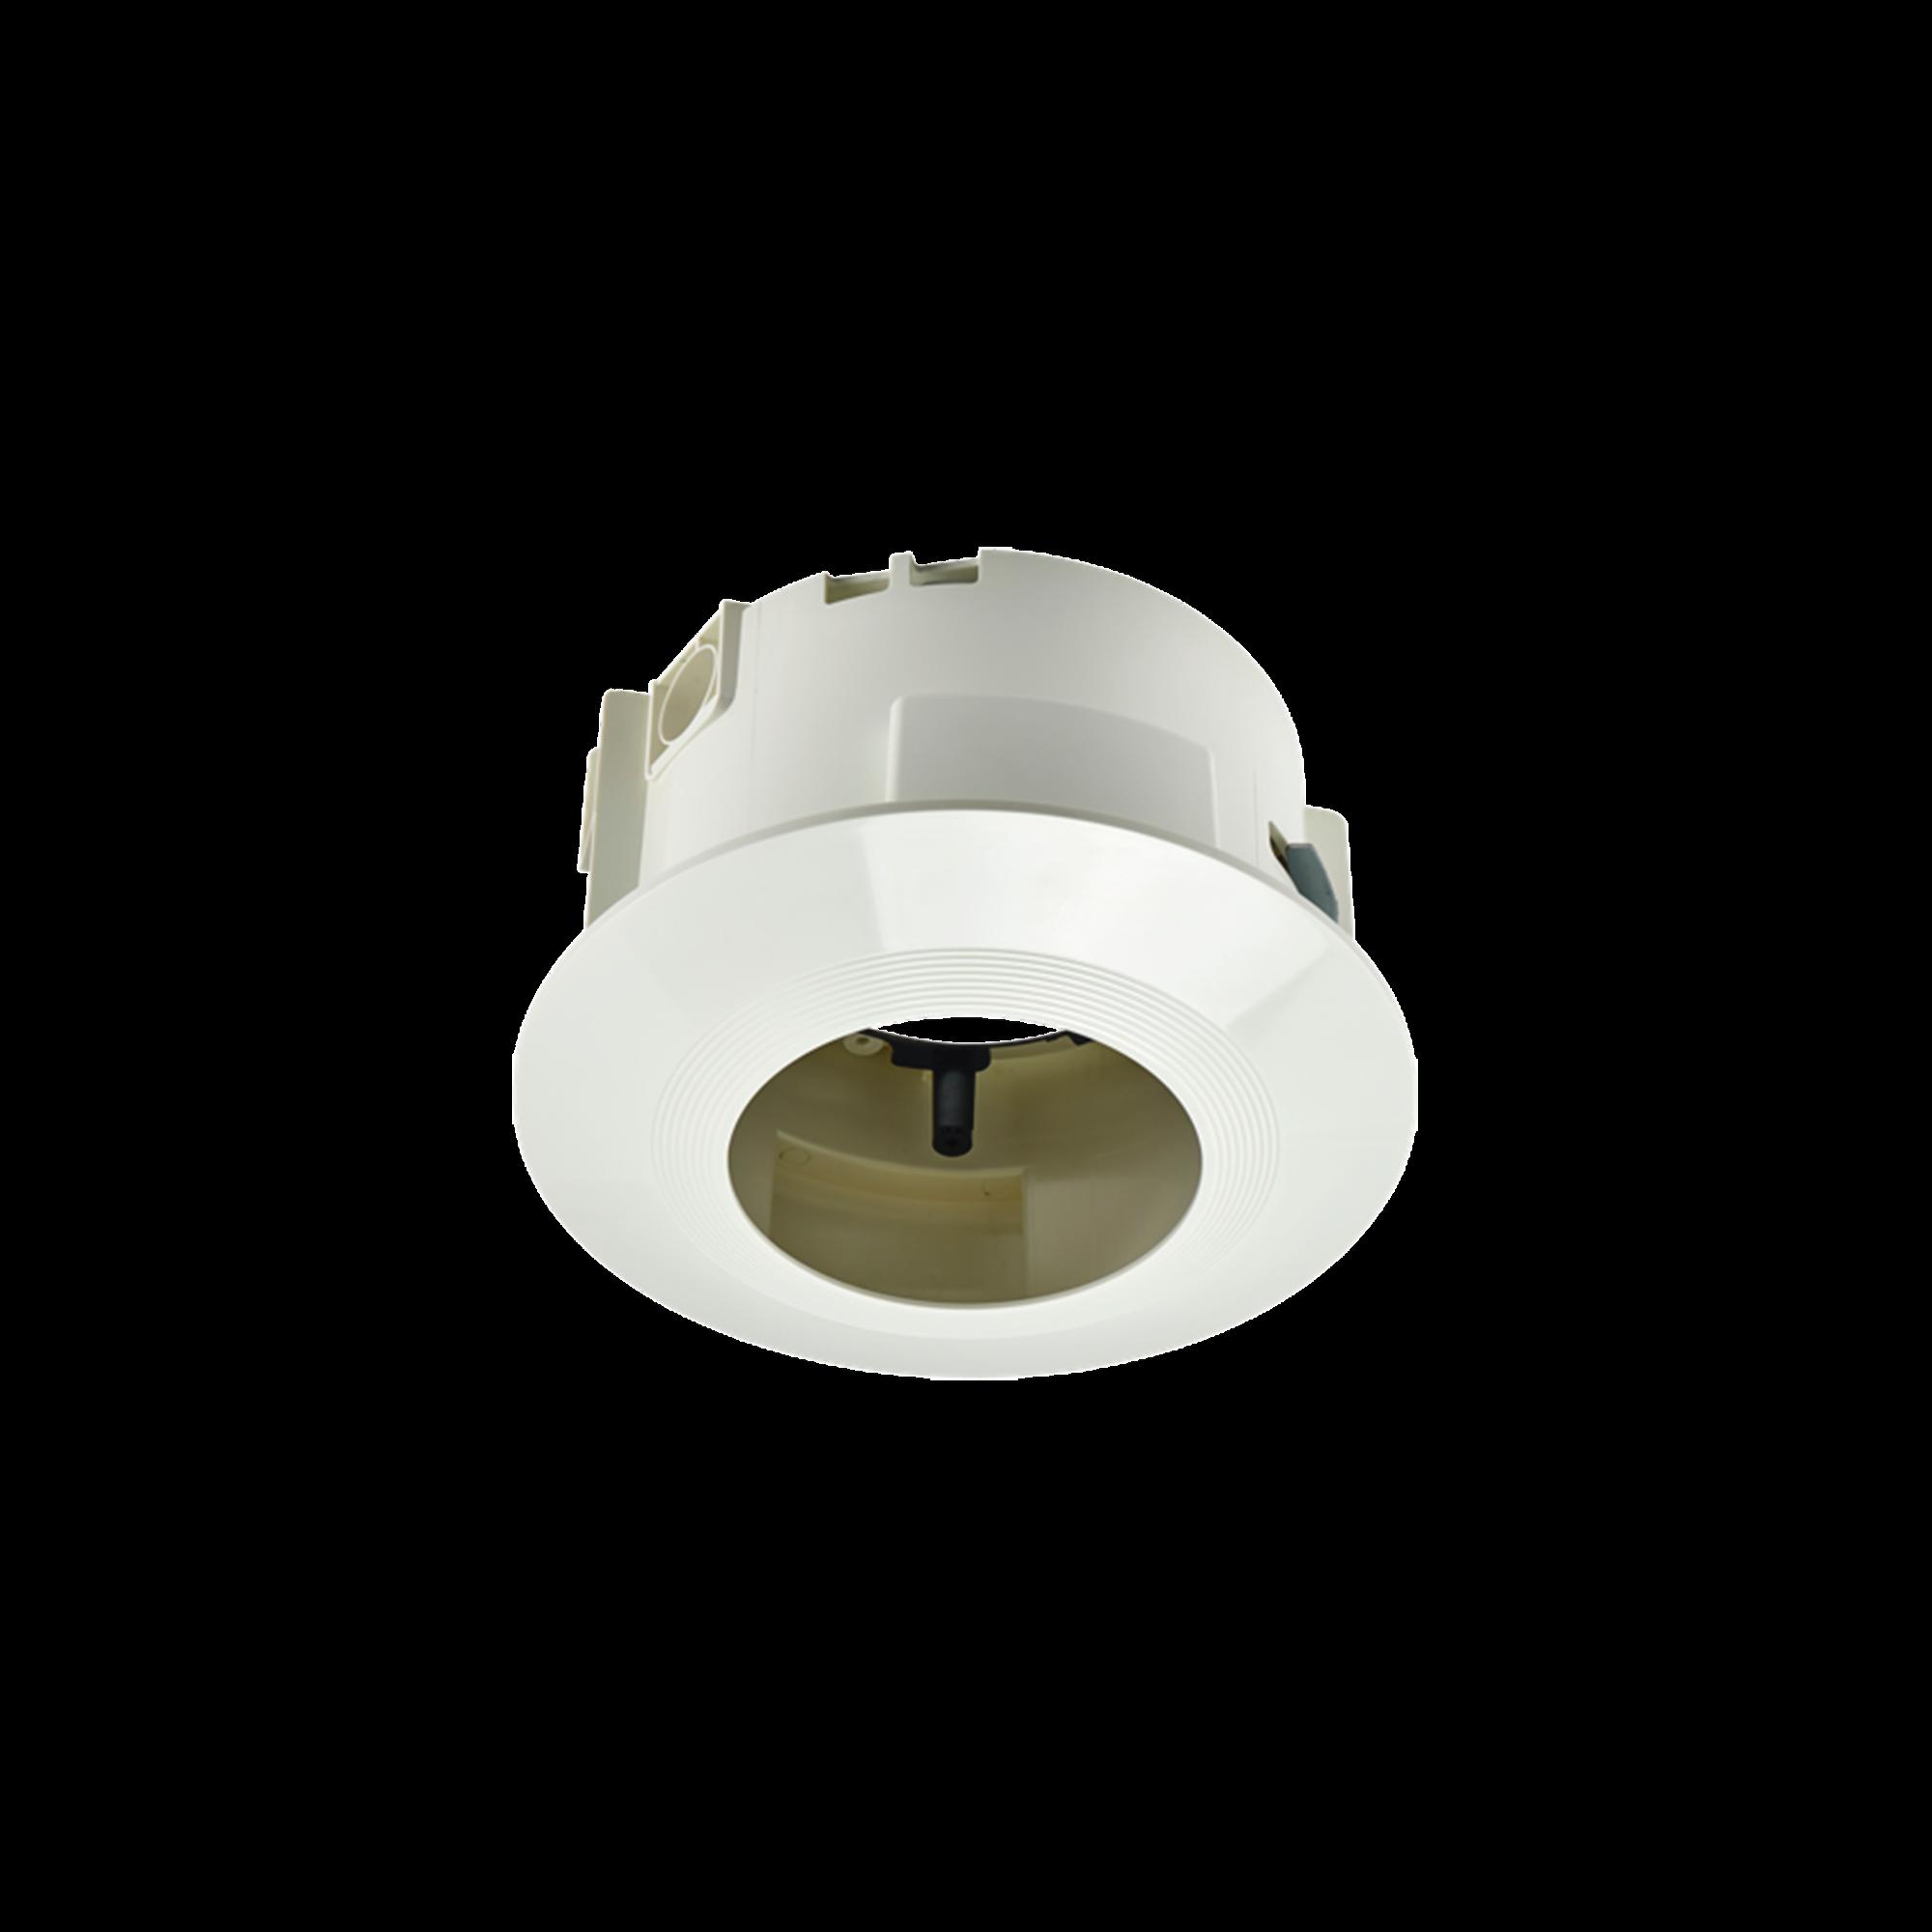 Montaje de Plafón para XNP-6120H, XNV-6120/6120R/6085 y XND-6085V/6085